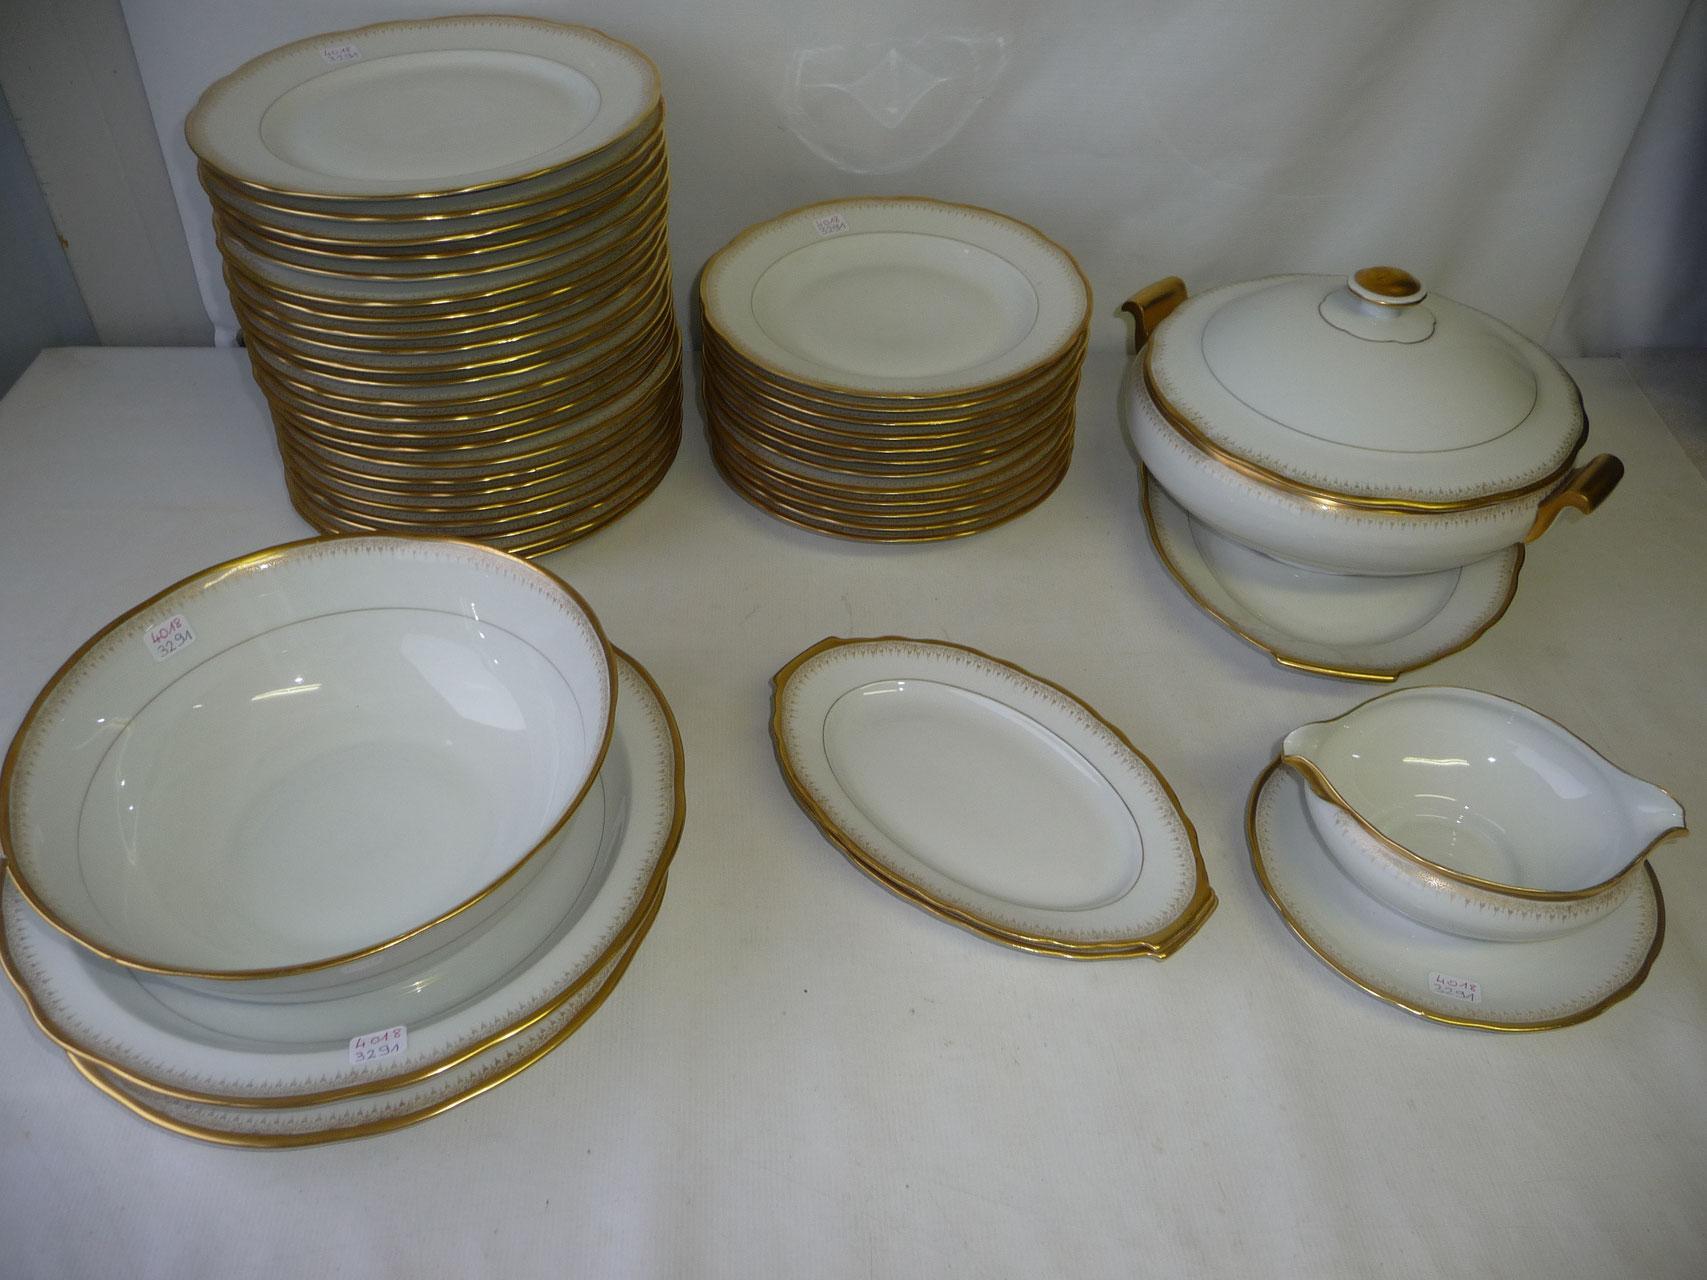 service de table porcelaine limoges service de table en. Black Bedroom Furniture Sets. Home Design Ideas